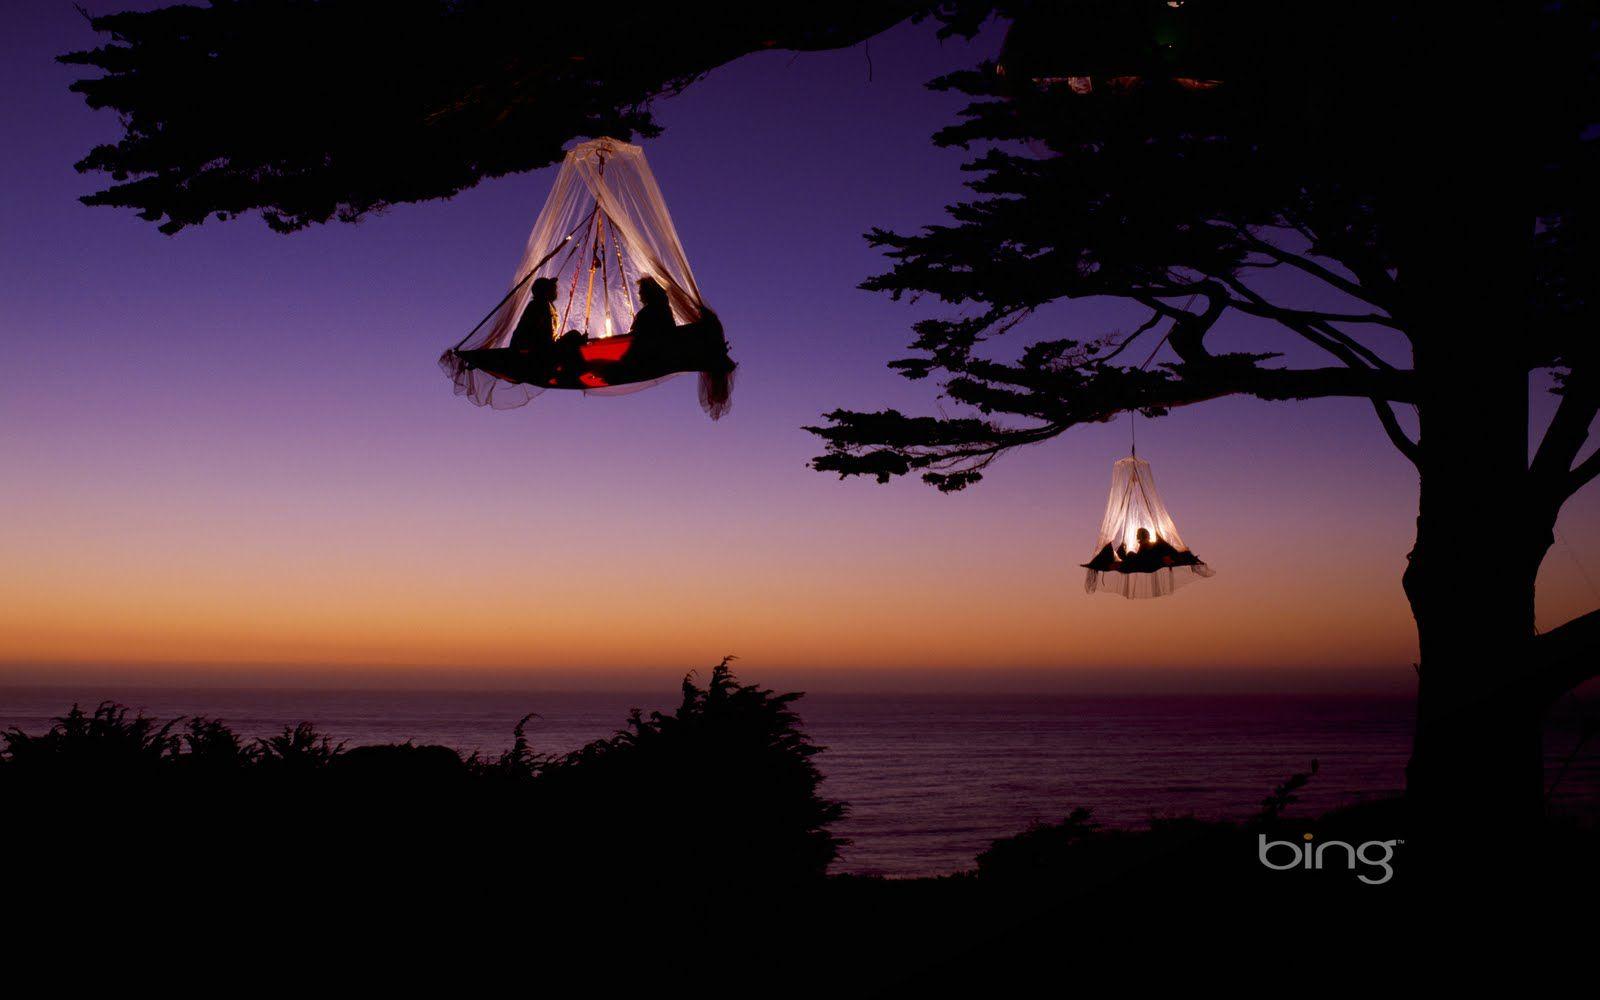 Bing Tree Camping Tree Tent Hanging Tent